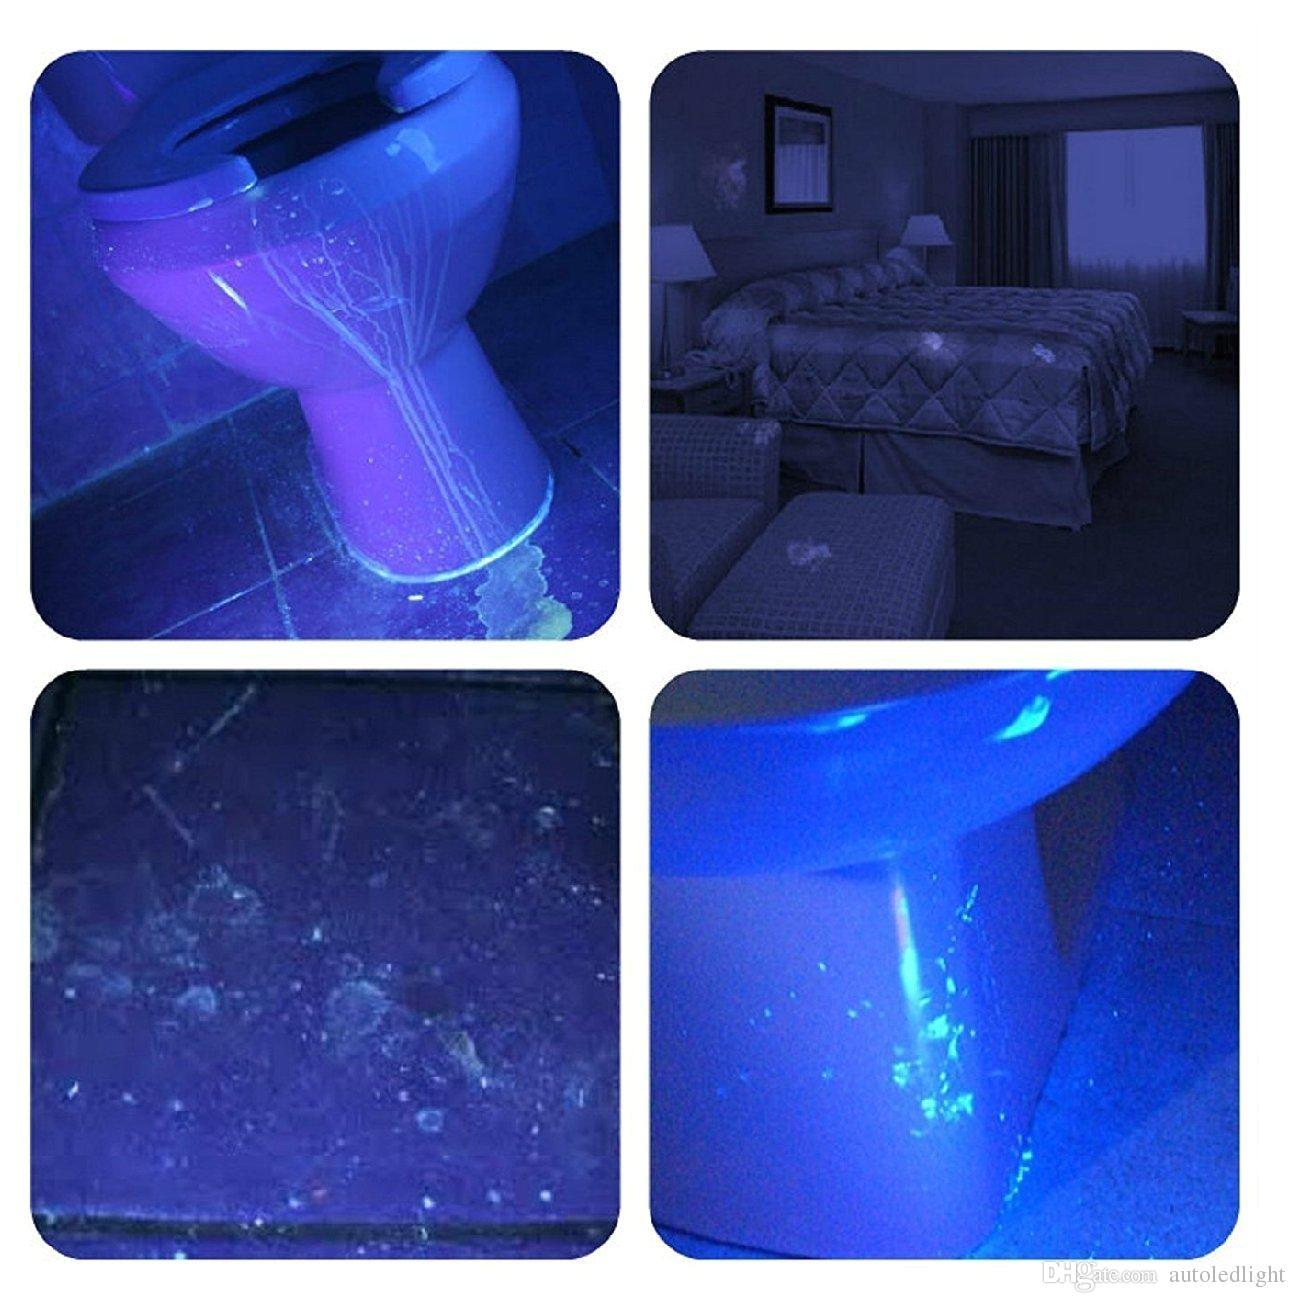 100 led blacklight uv flashlight emits a powerful 30 foot ultraviolet flood light beam